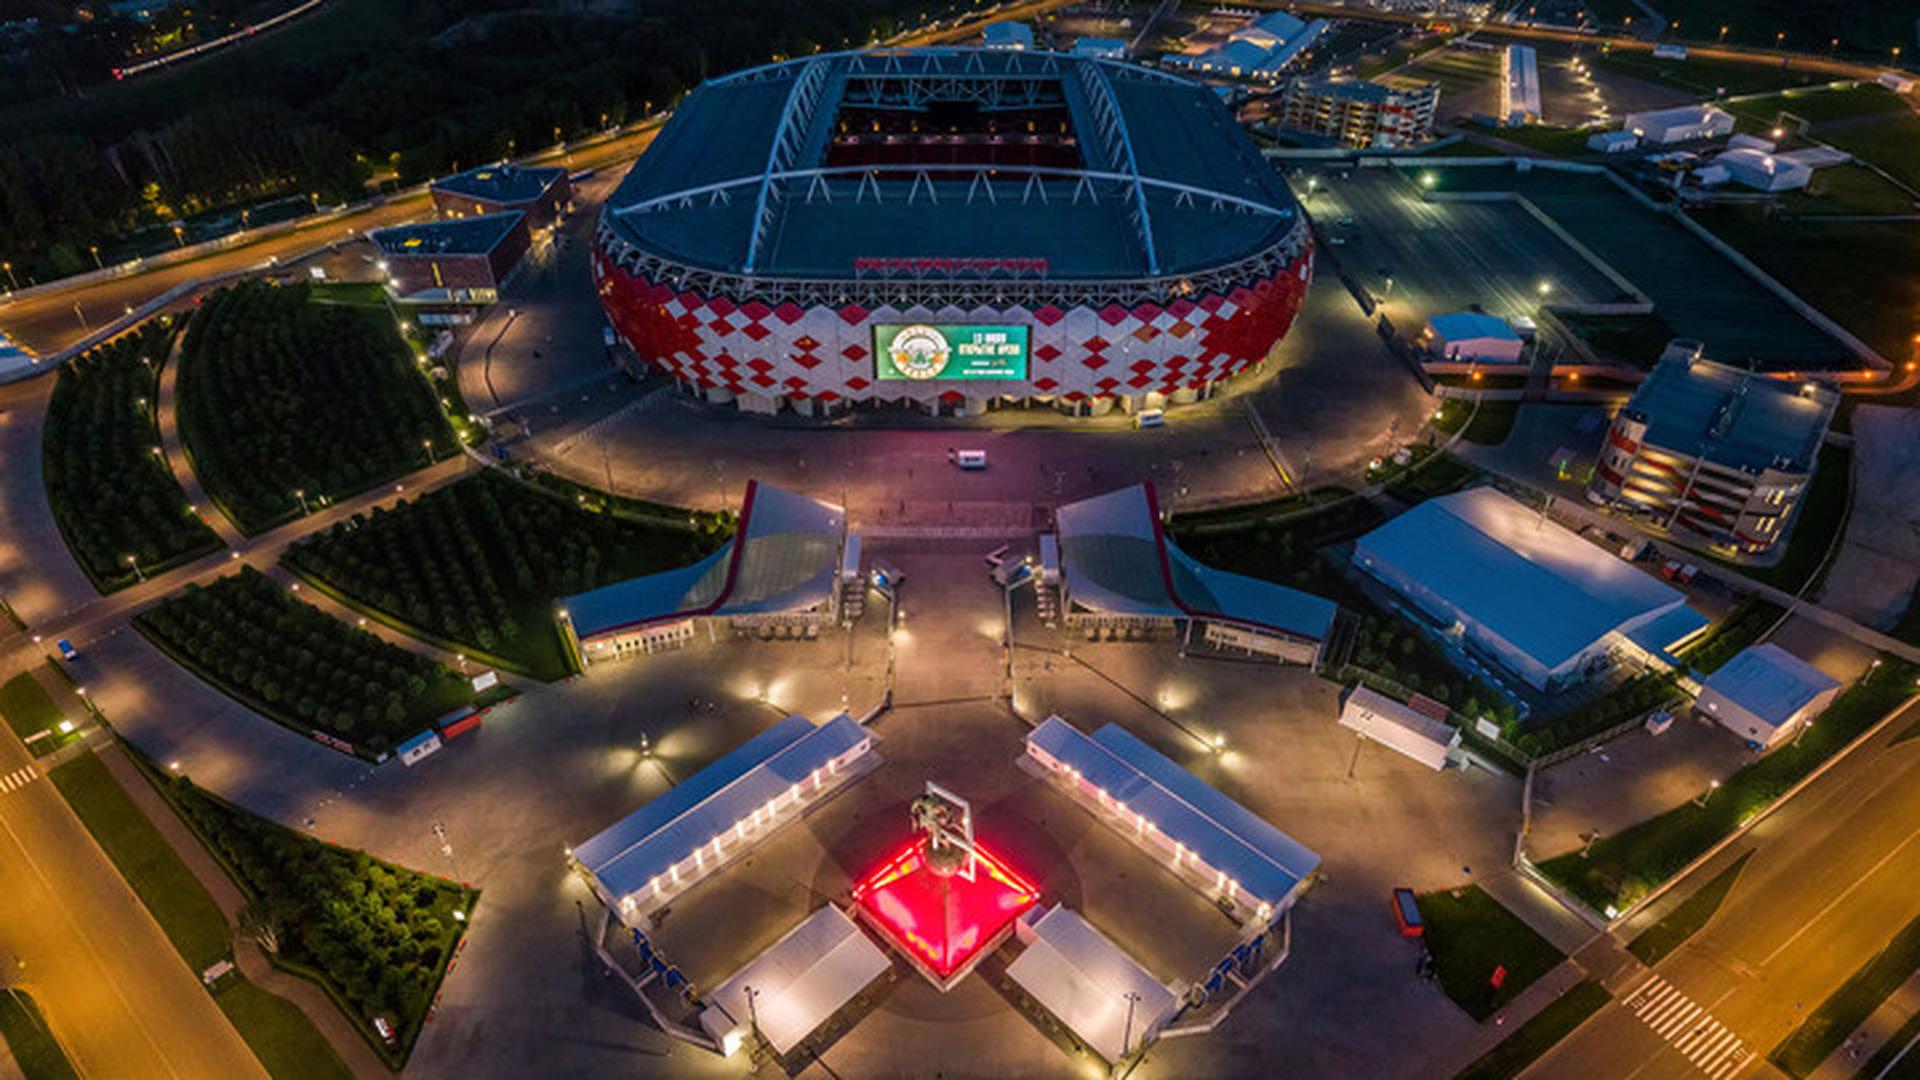 На финал чемпионата мира по футболу в Москву приедут главы 10 государств